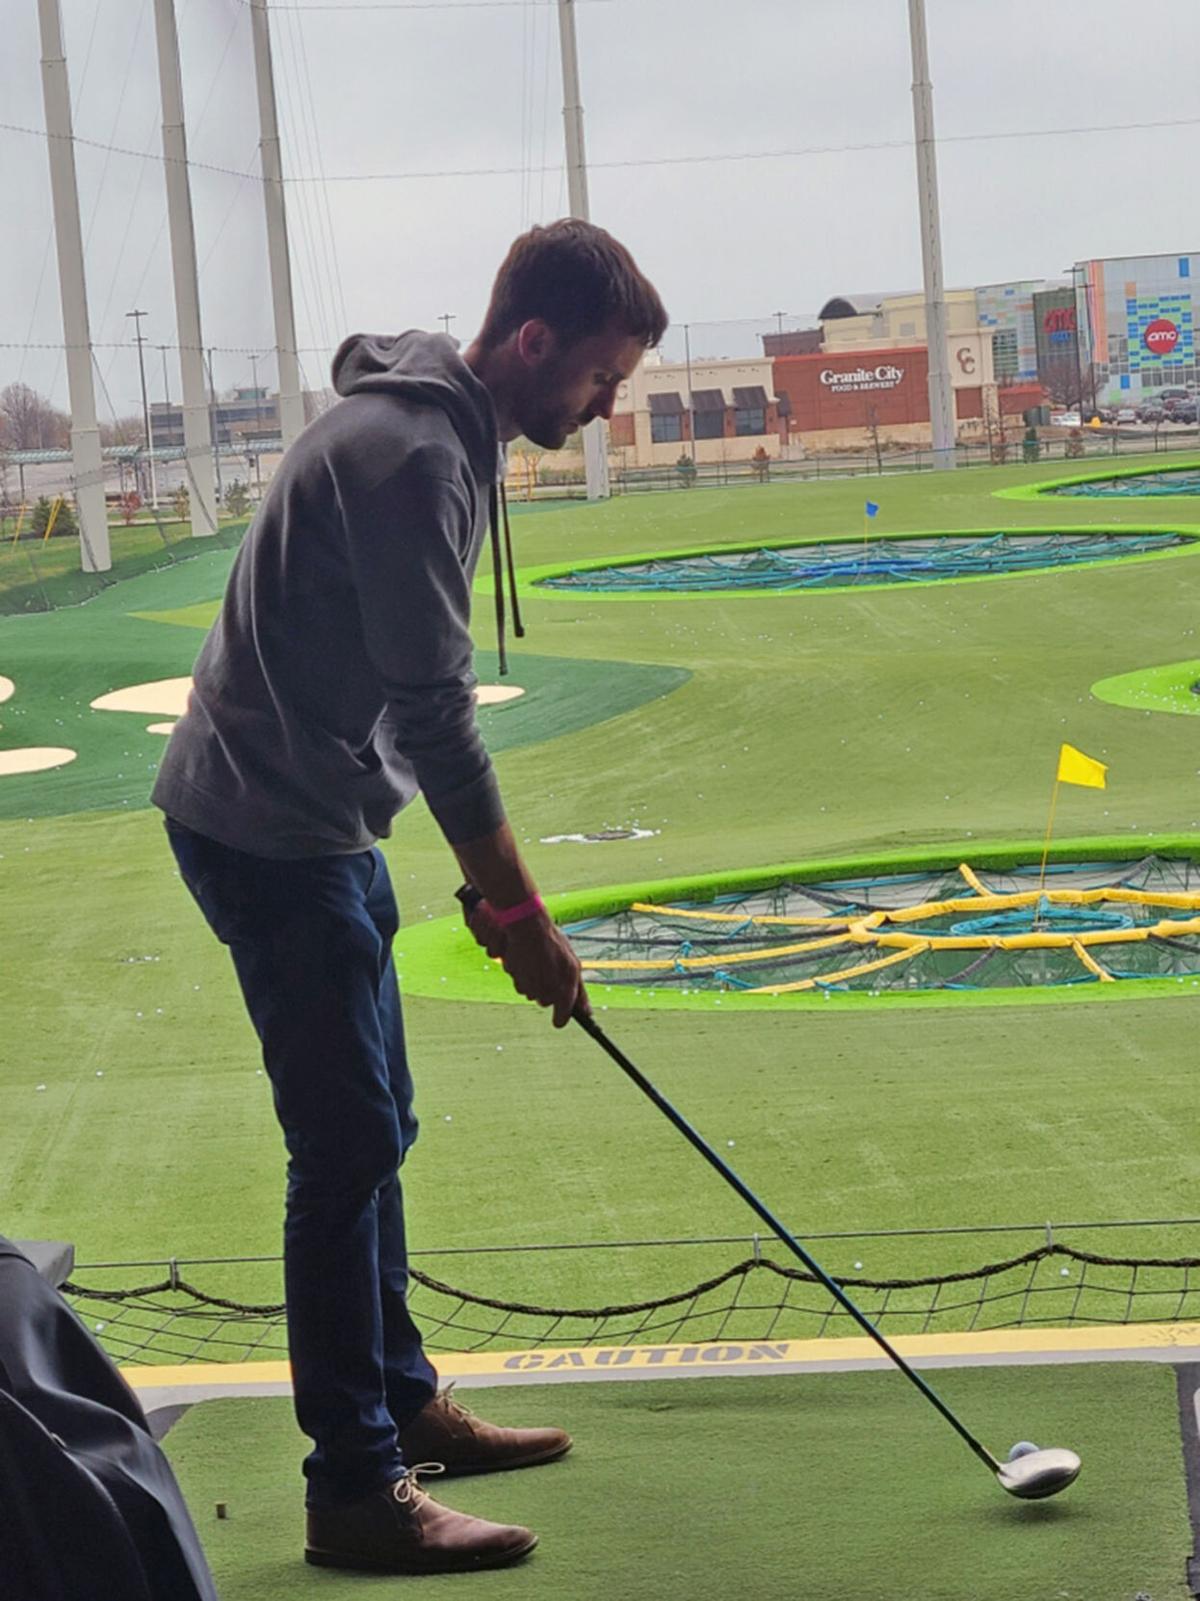 20210414_gb_golf2.jpeg